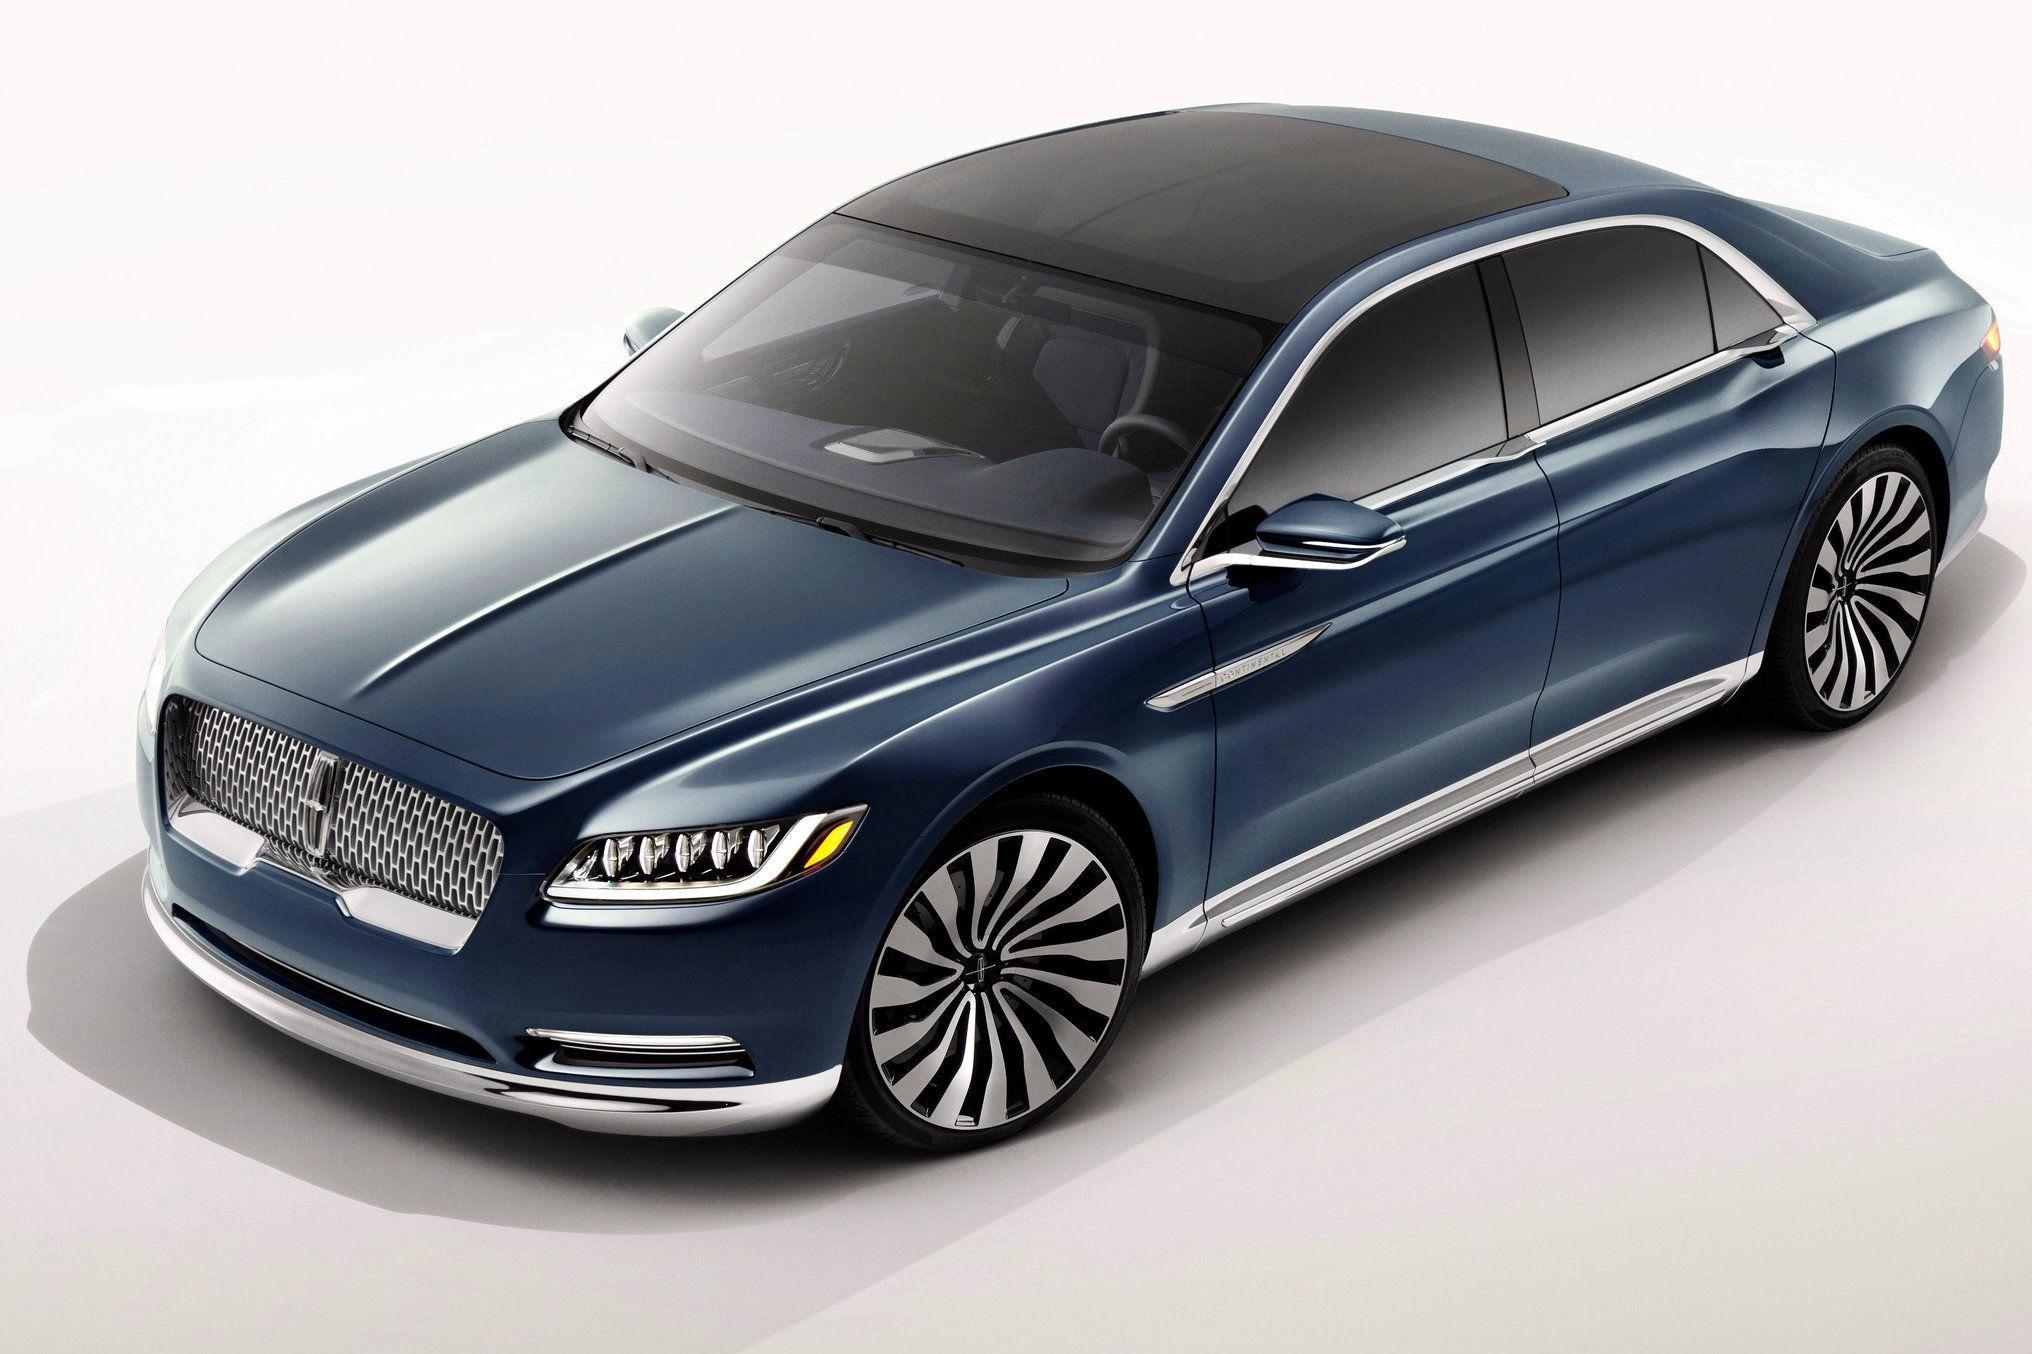 2017 Lincoln Continental Concept Car